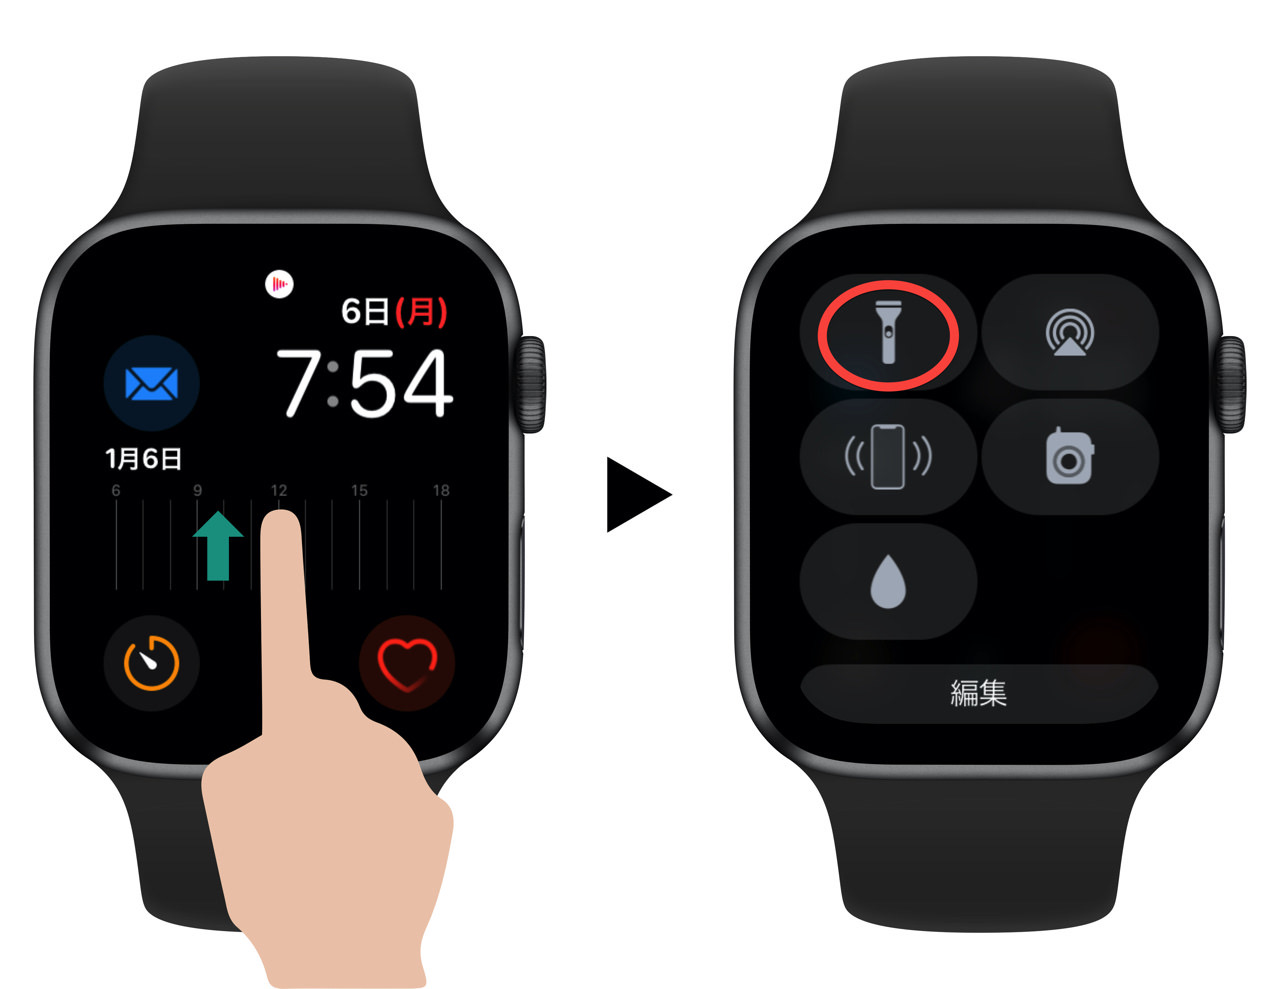 Apple watch flashlight9